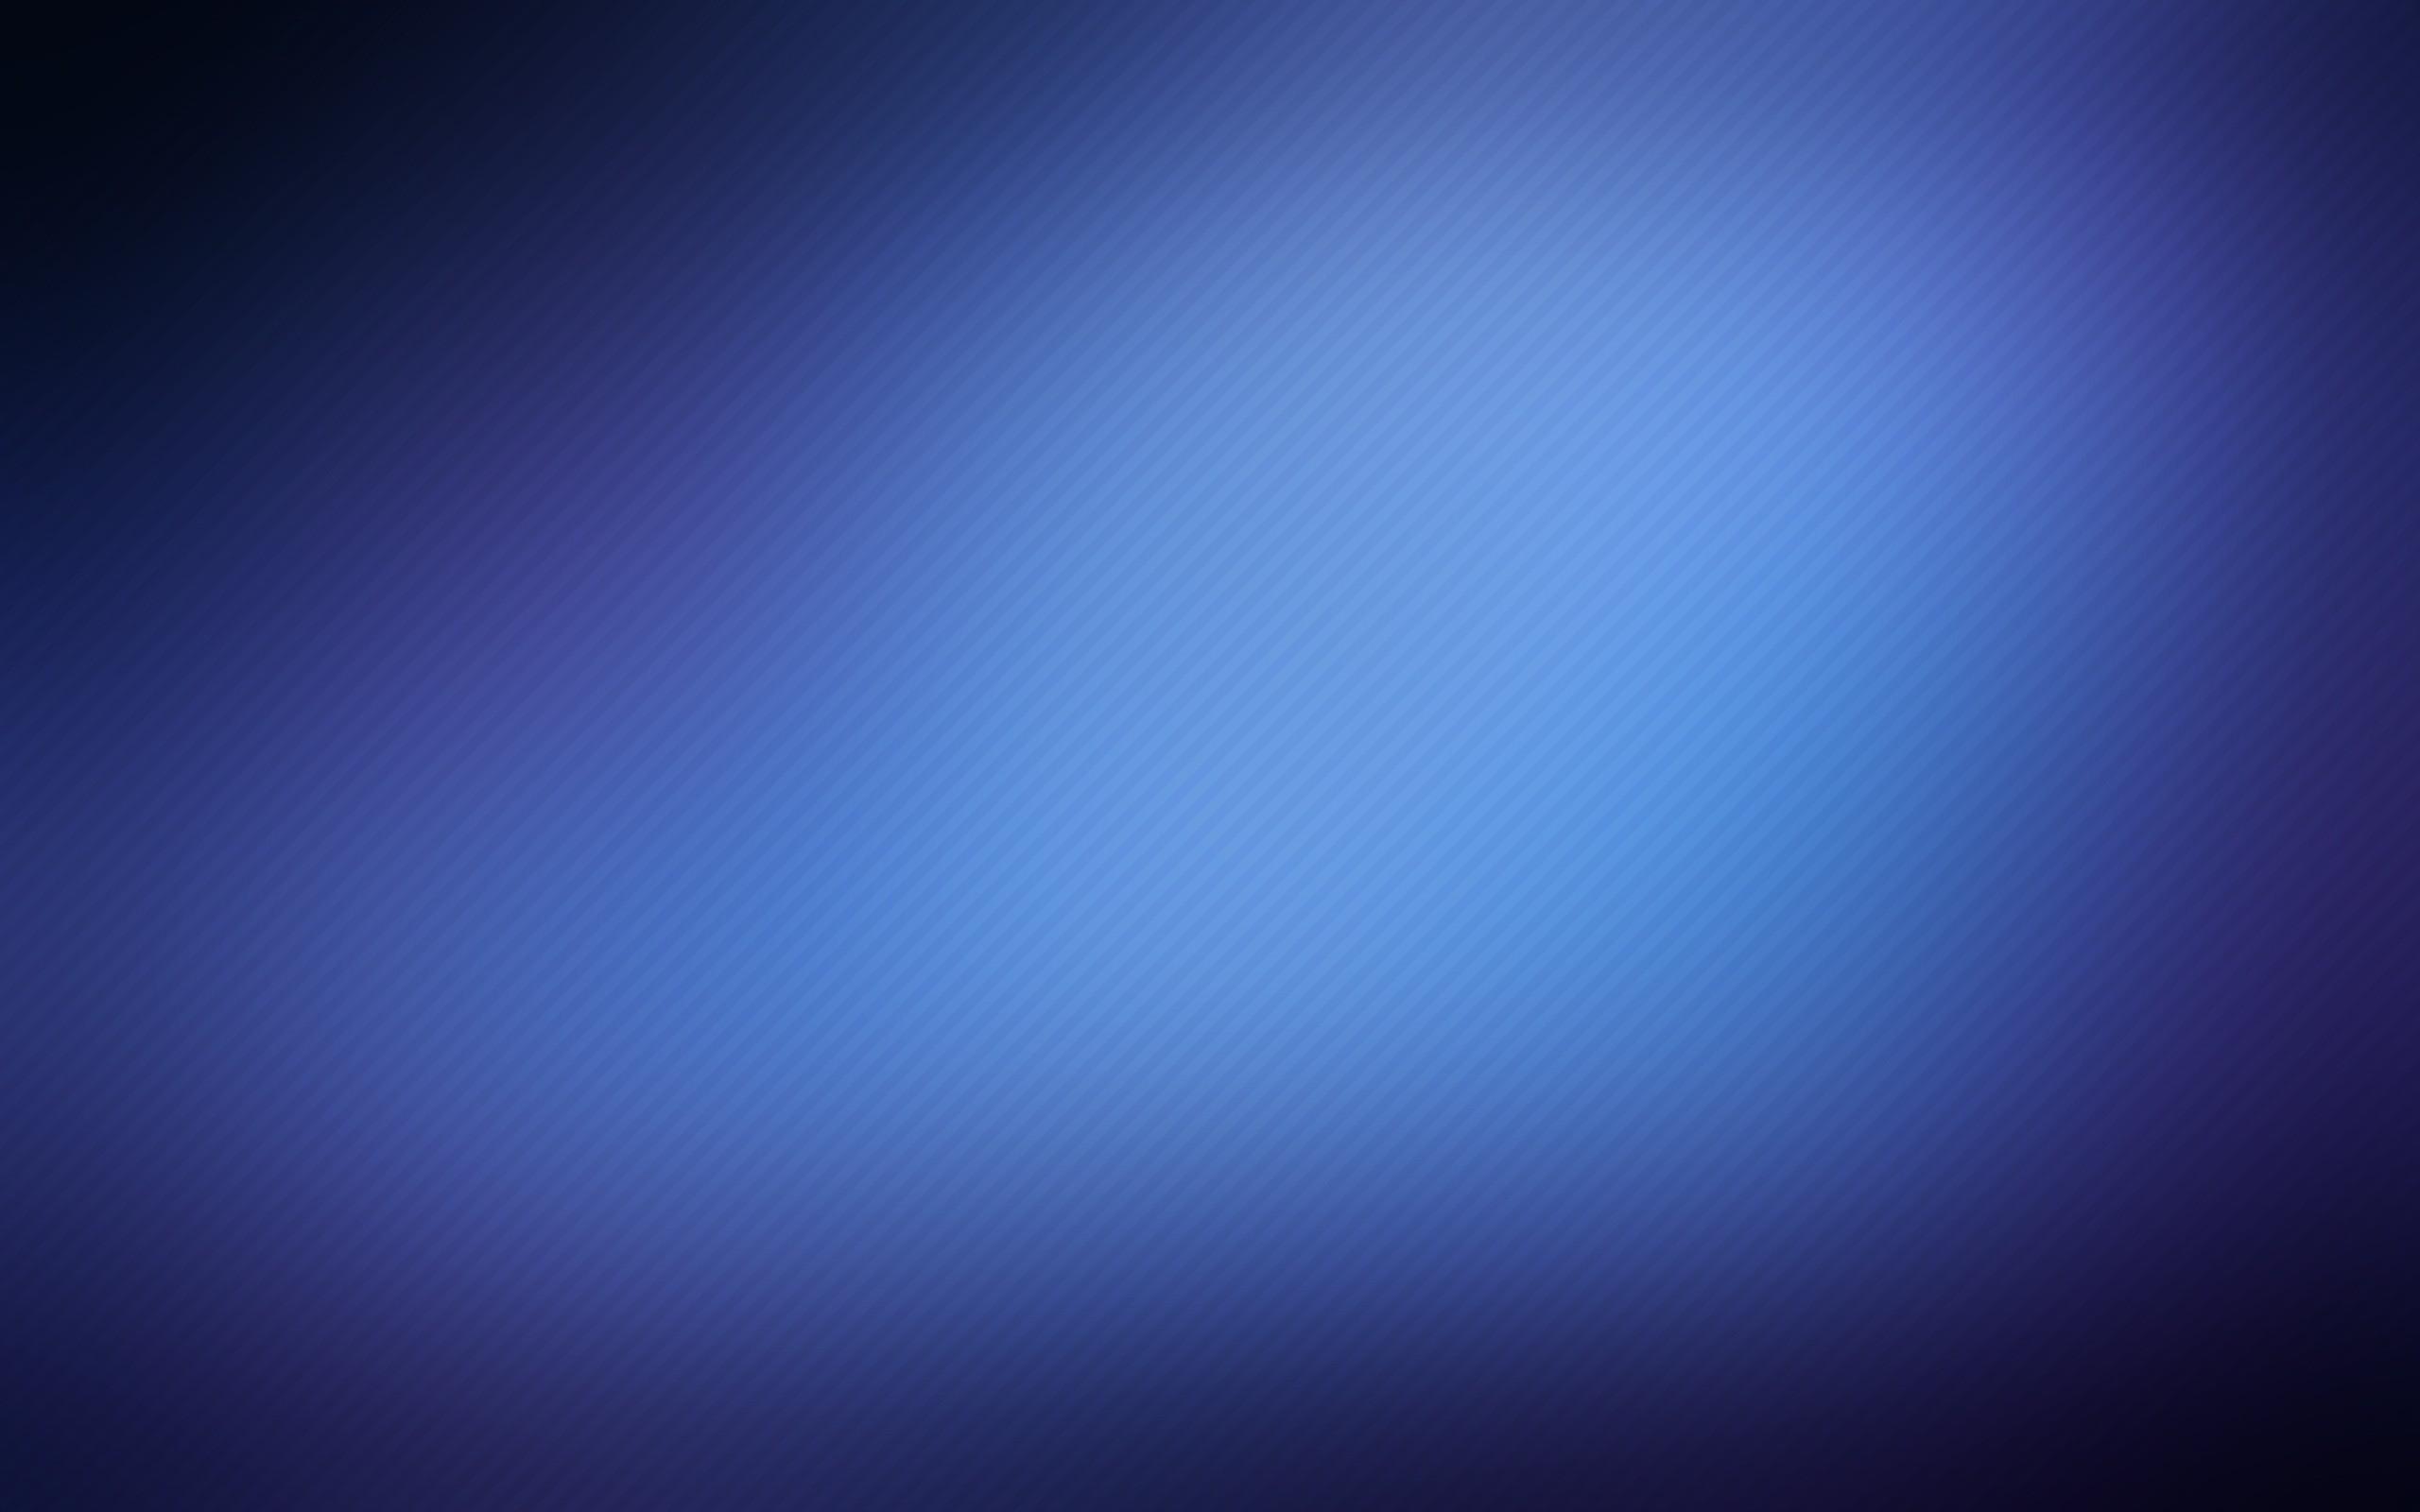 Plain Background wallpaper   1076012 2560x1600